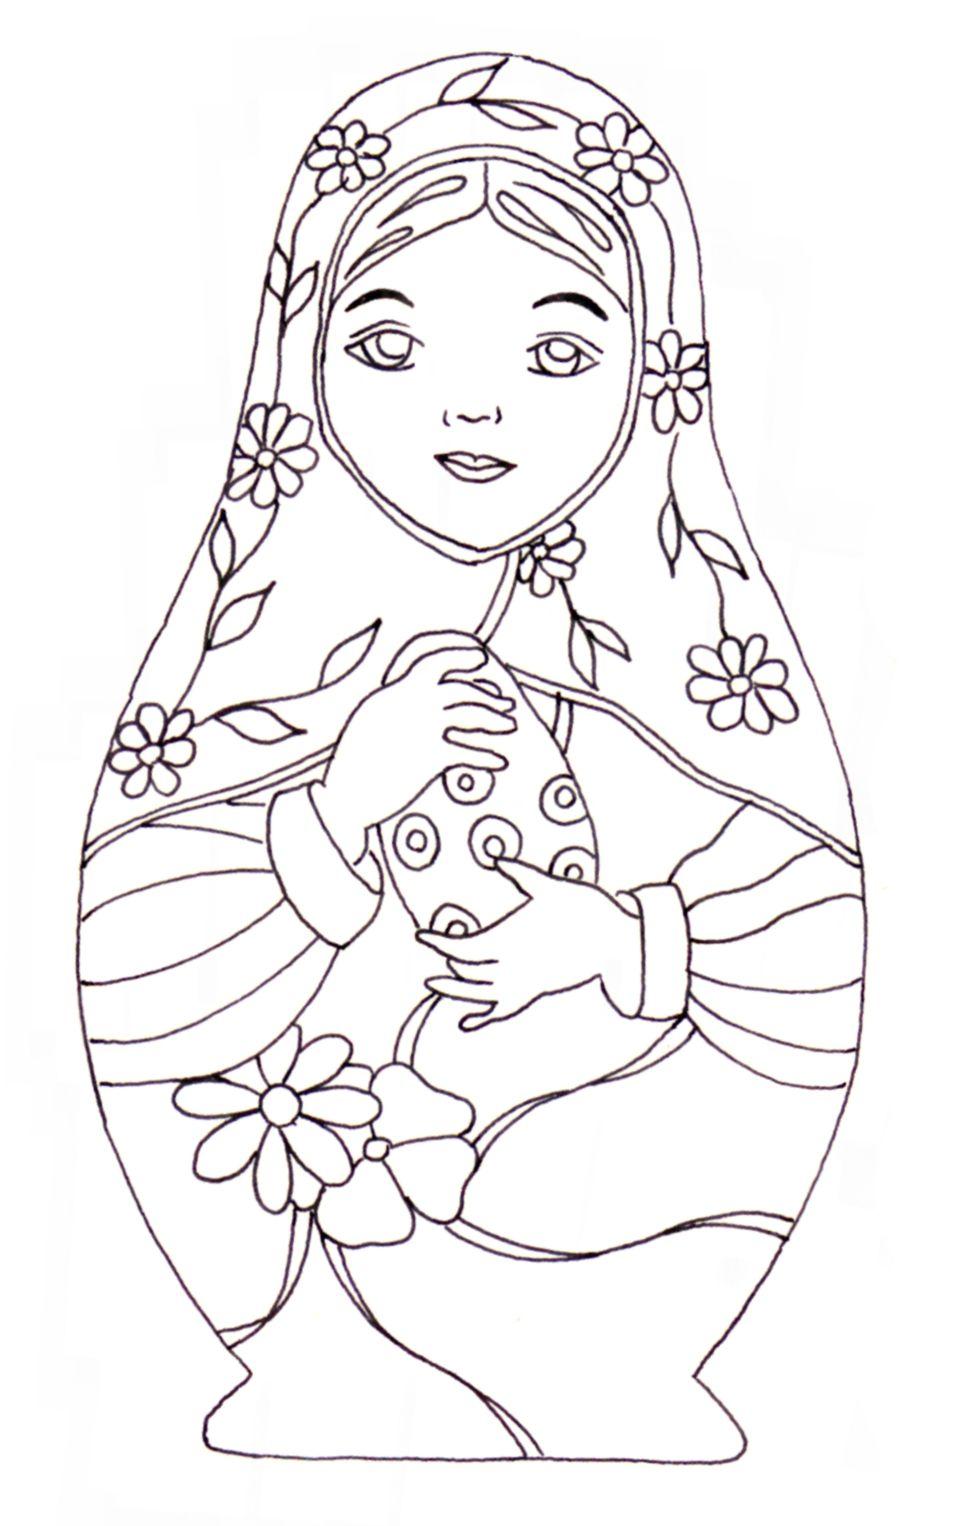 matroyshka dolls coloring pages - photo#17